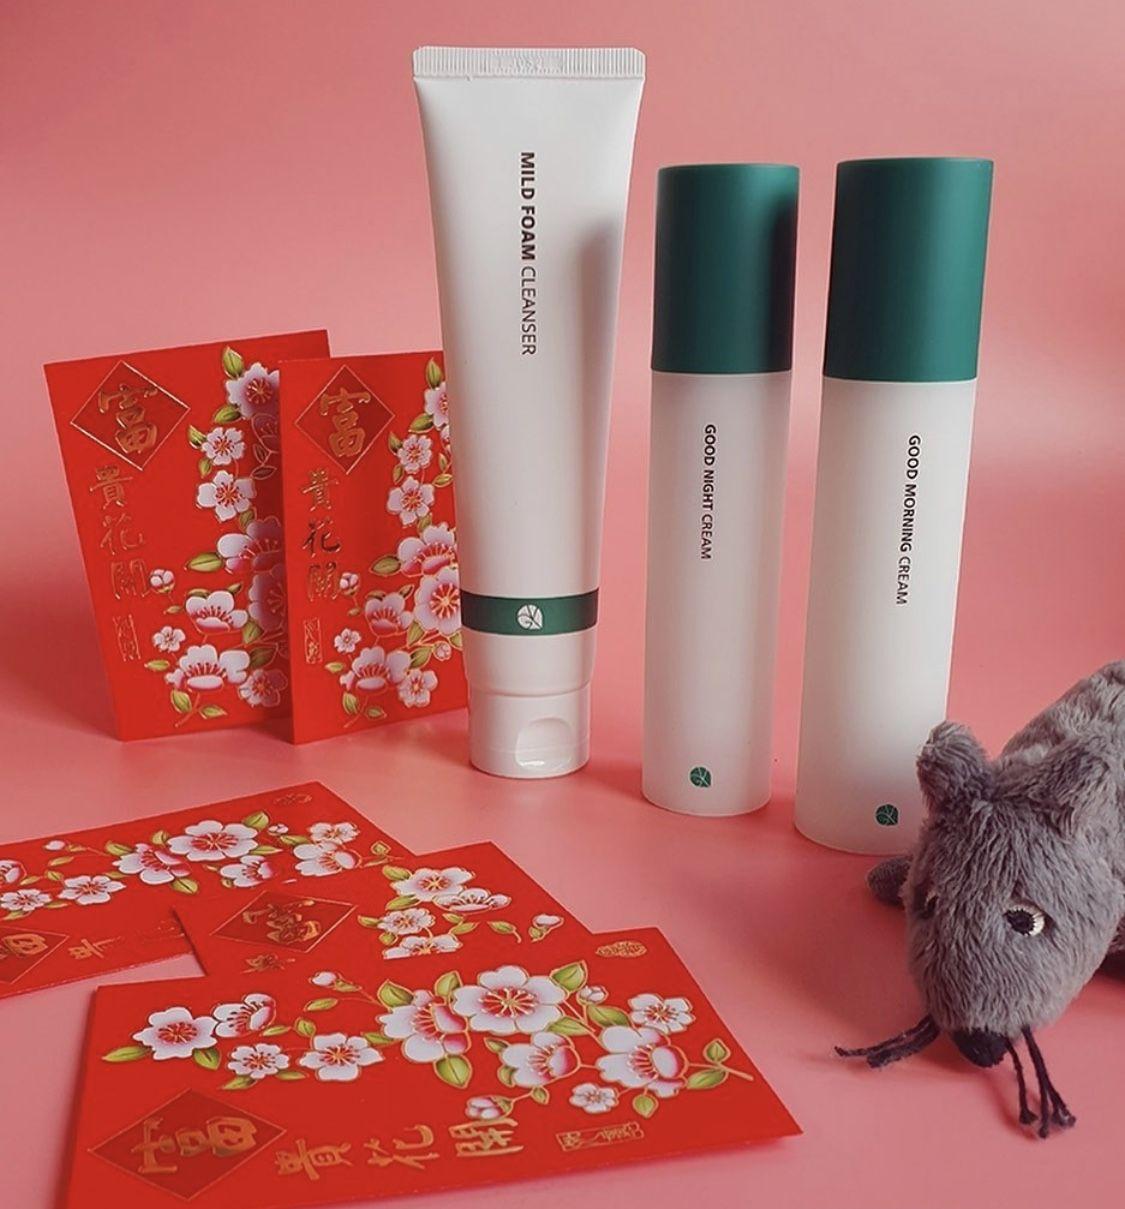 Seollal Korean New Year in 2020 Glowing skincare, Best